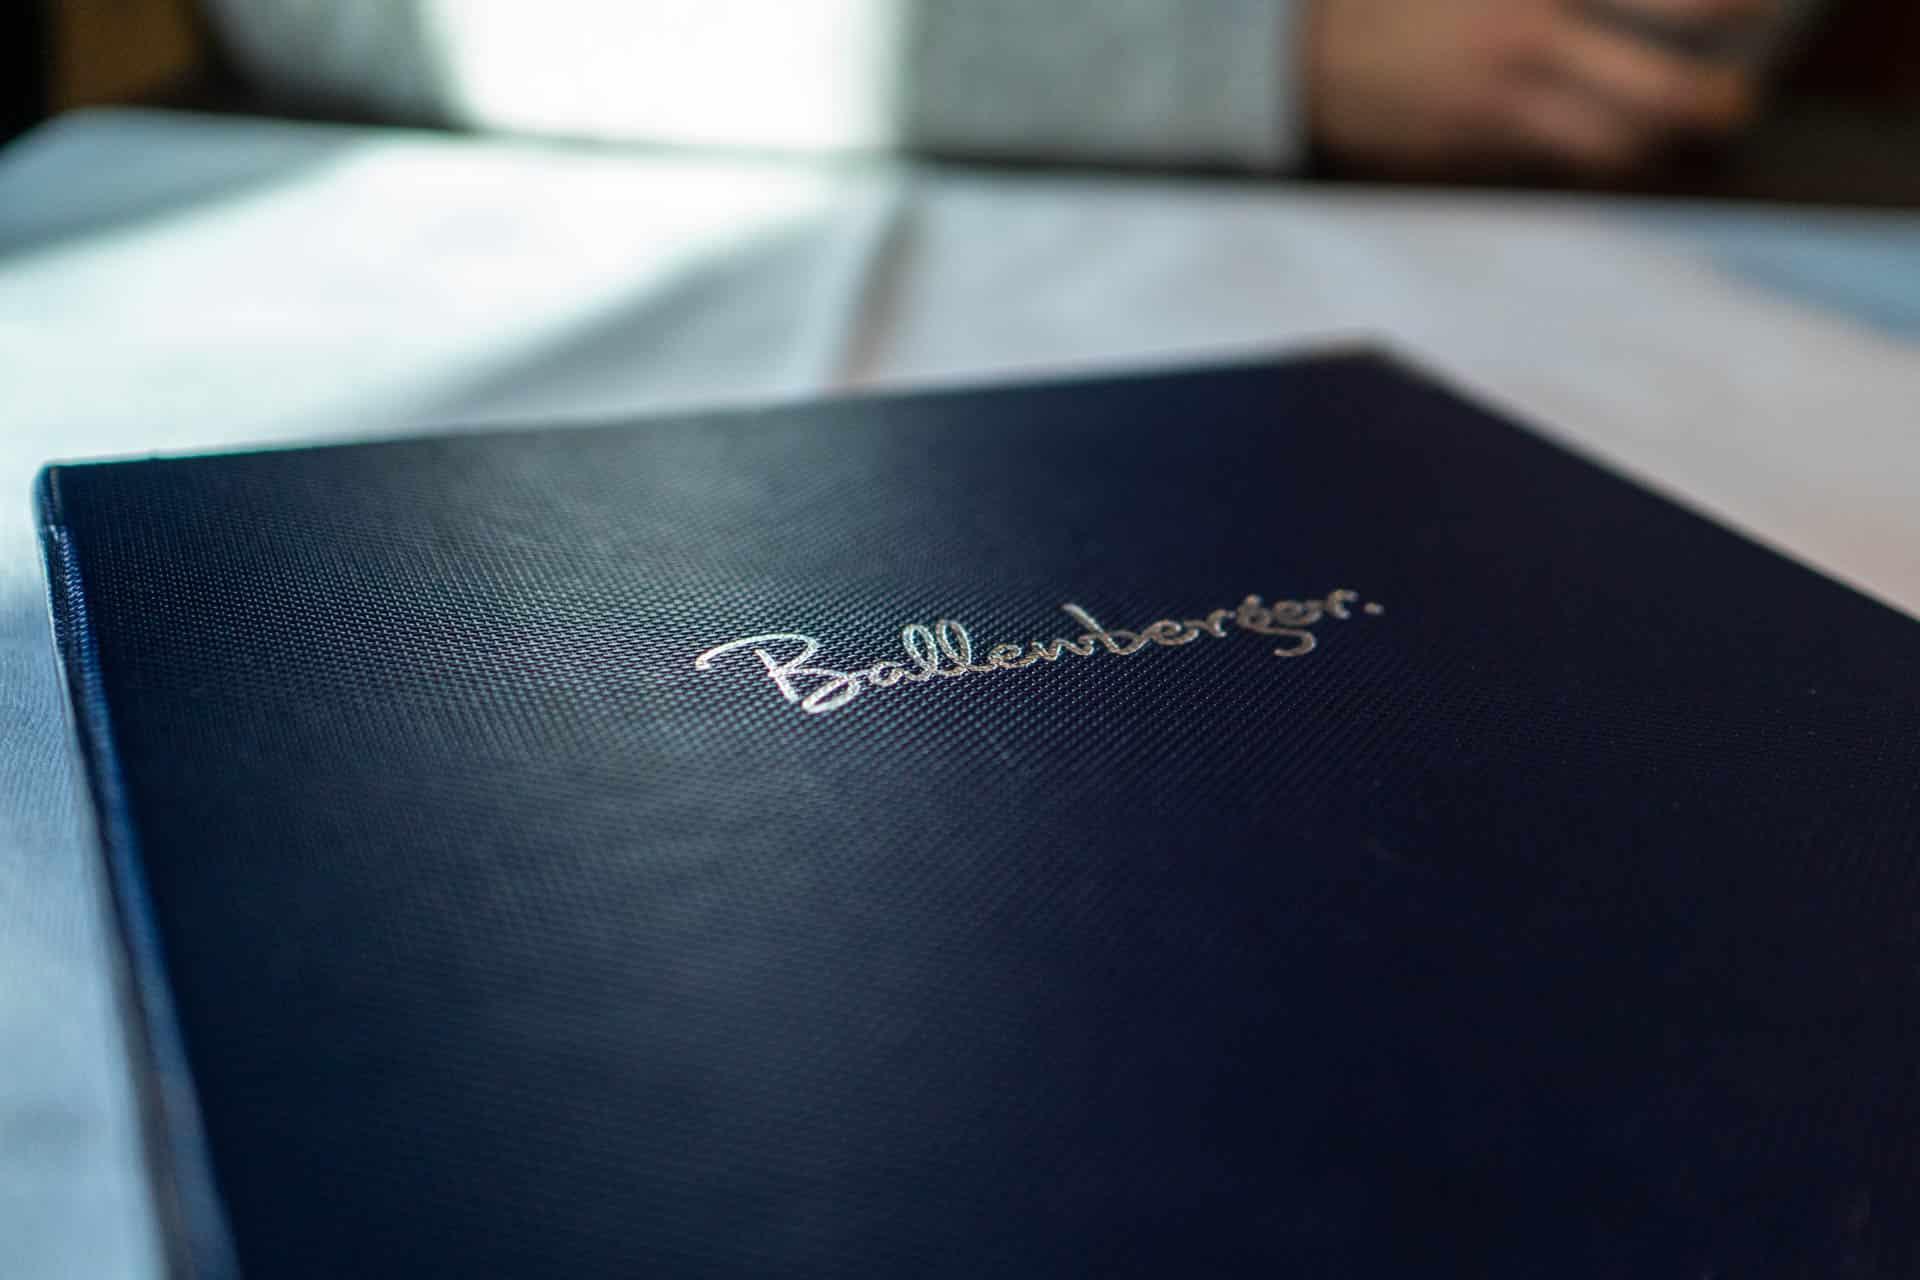 Speisekarte Ballenberger Erfurt